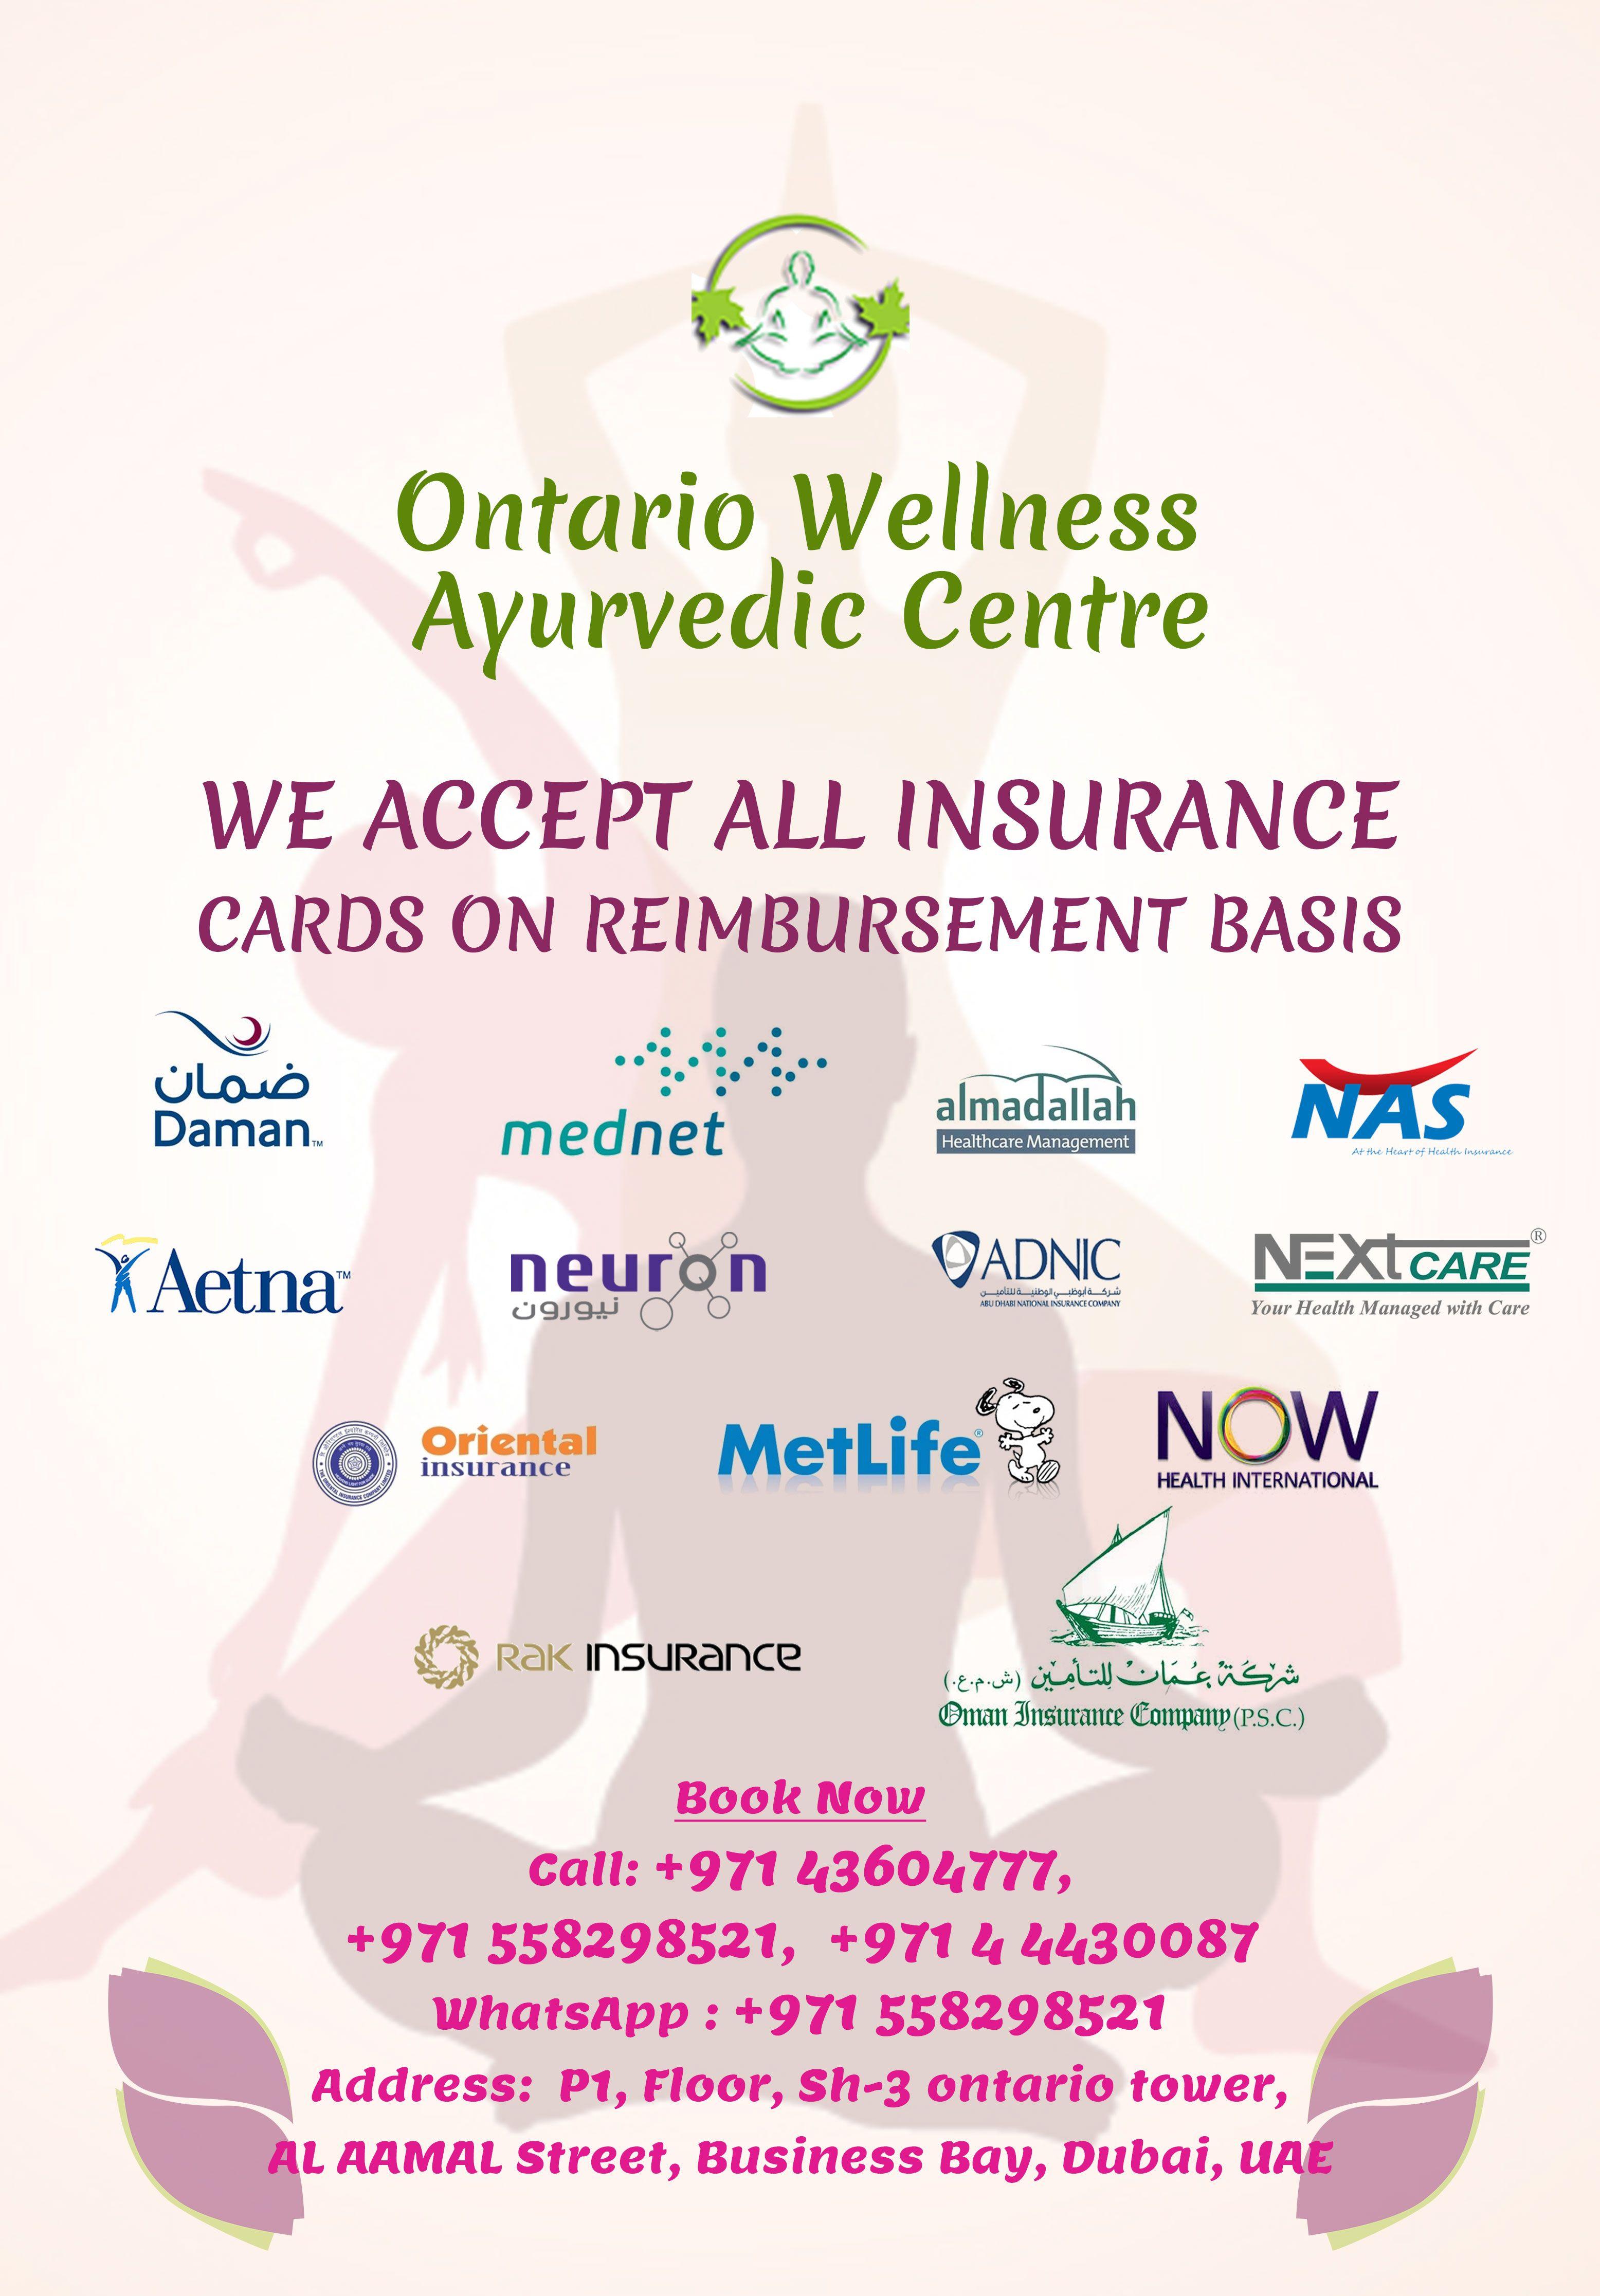 Ontario Ayurvedic Wellness Center Llc We Accept All Insurance Card